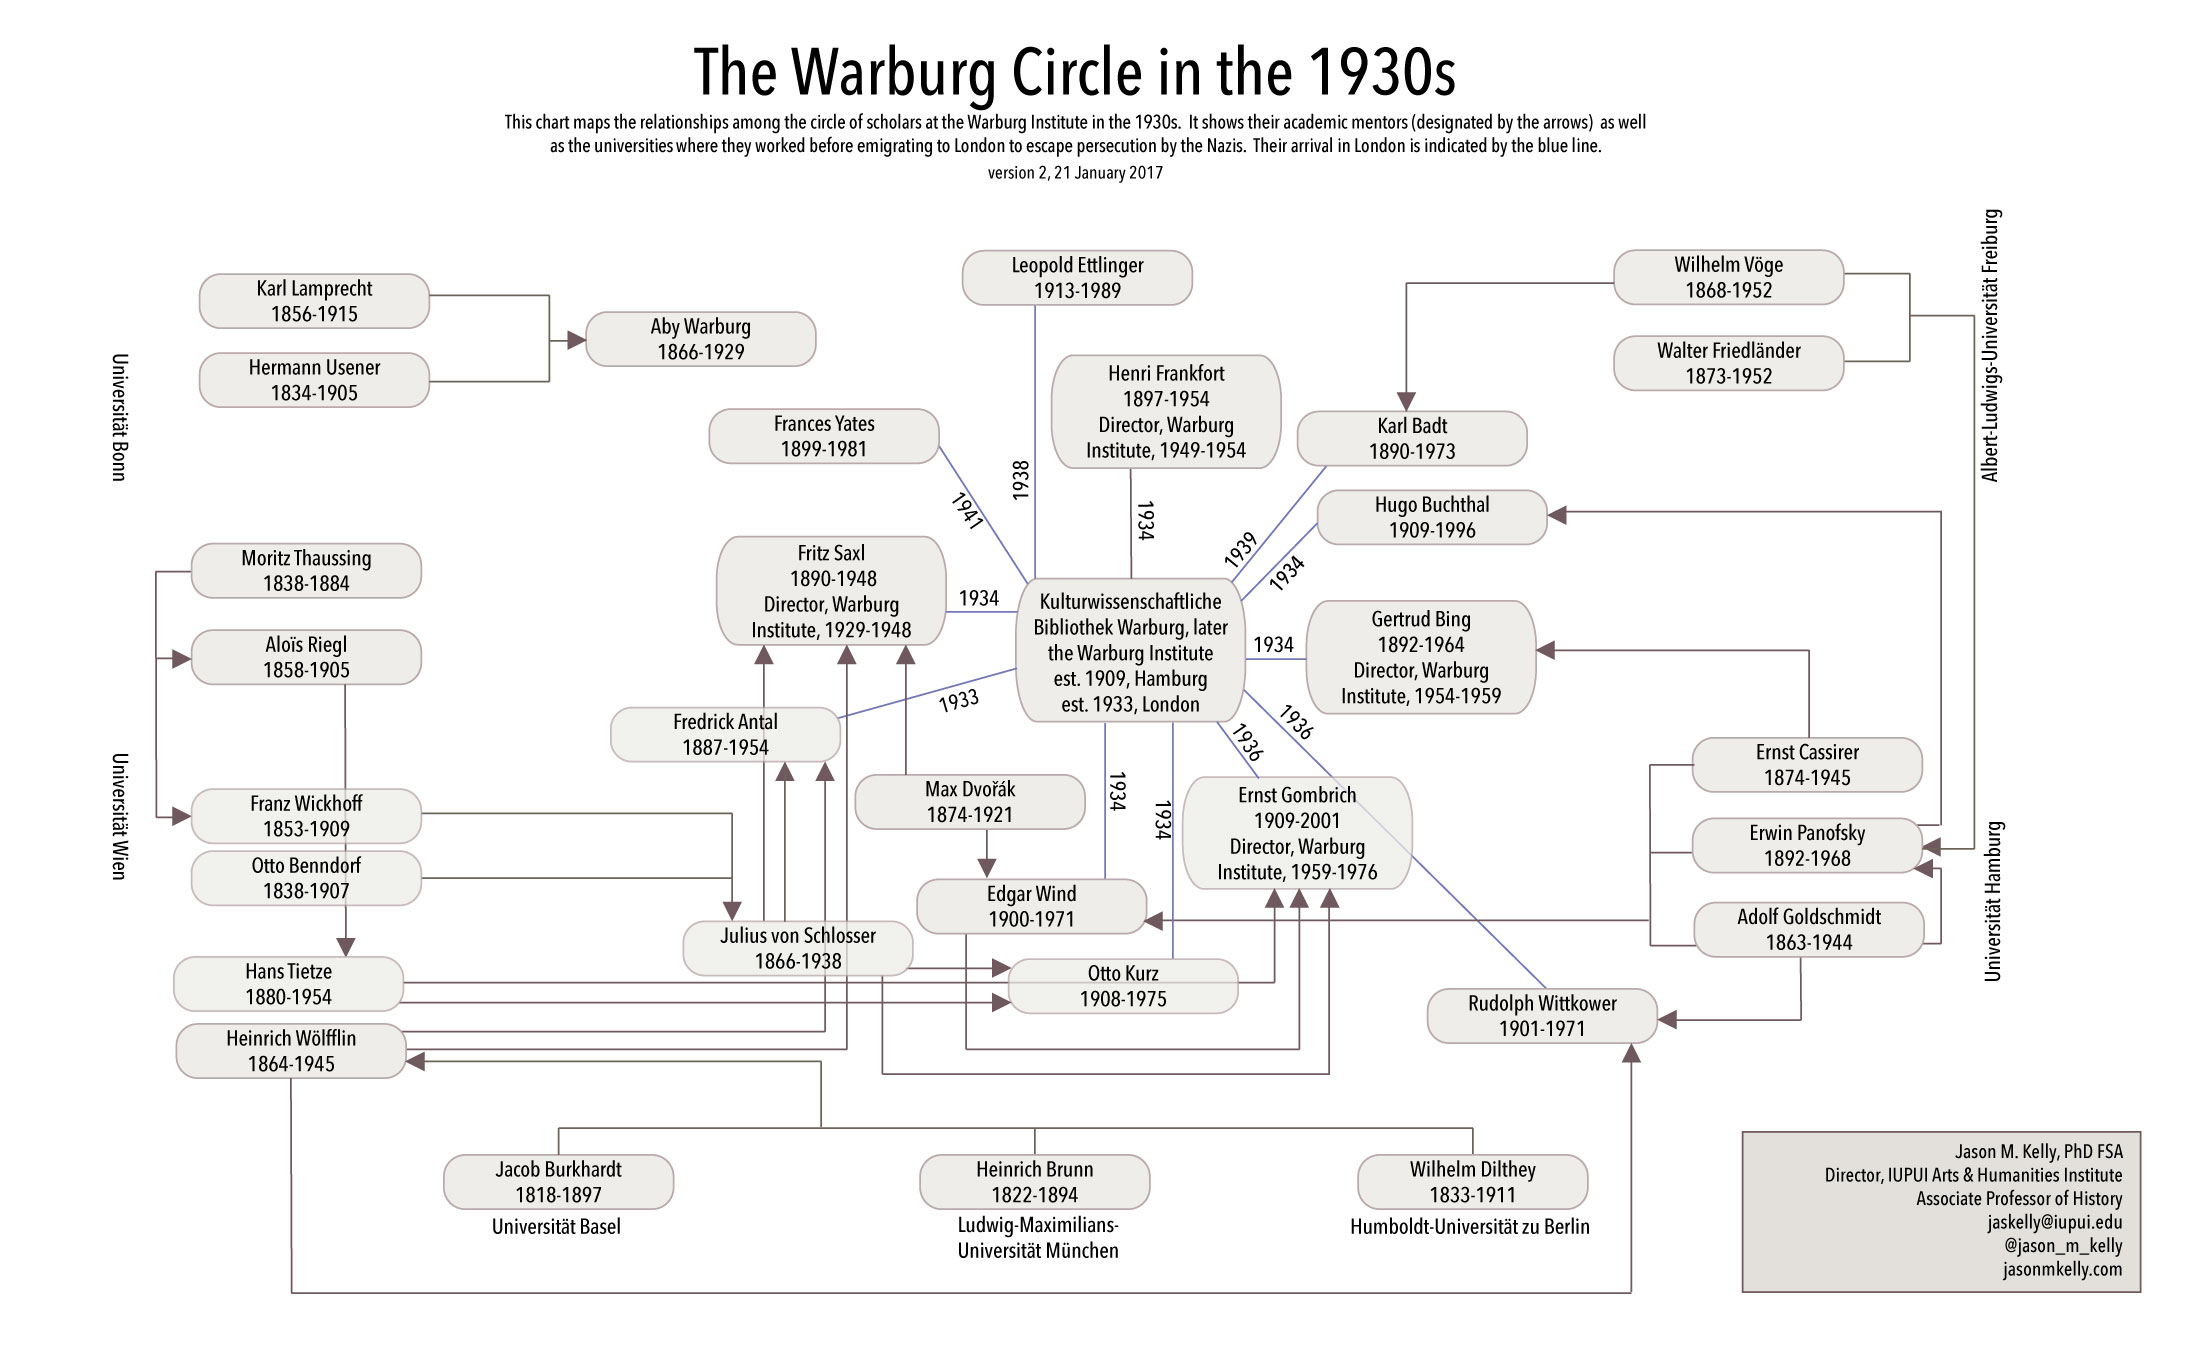 The Warburg Institute in London